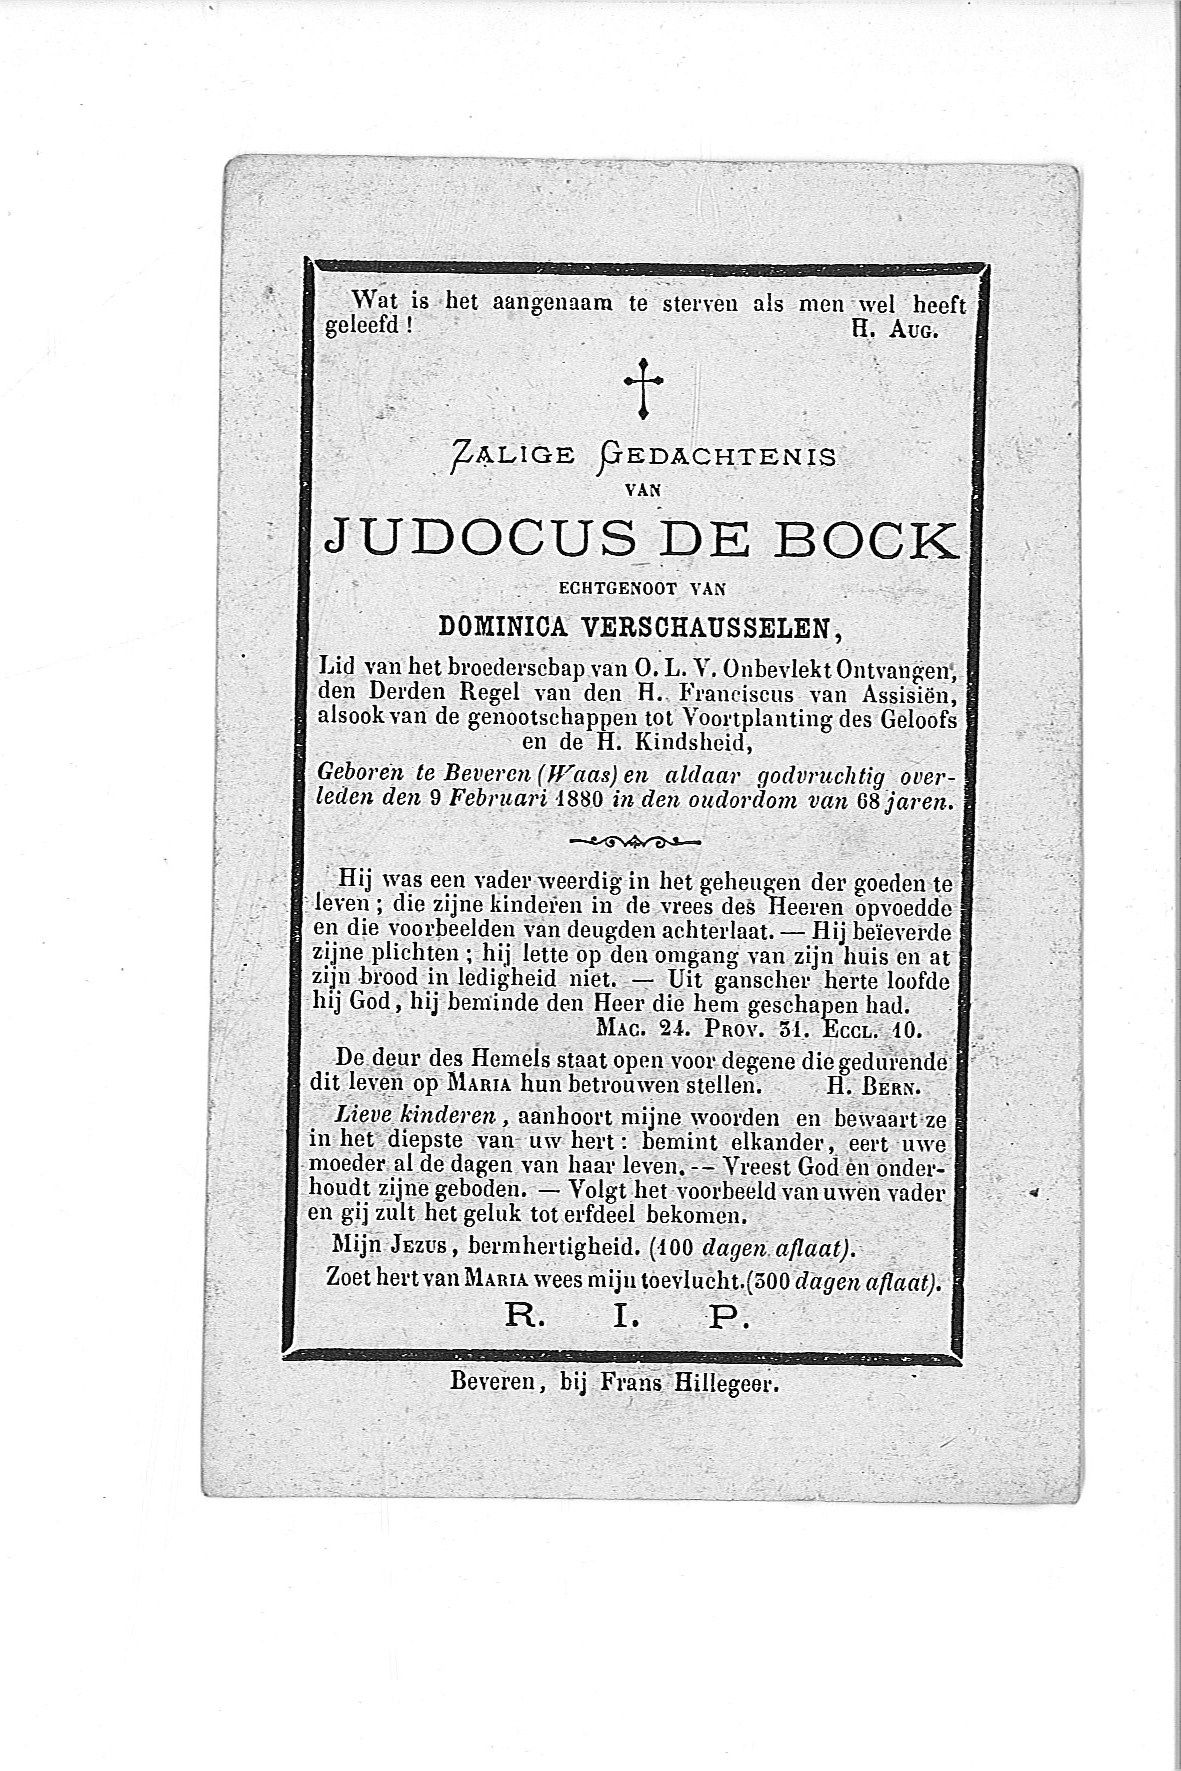 judocus(1880)20090409100949_00033.jpg